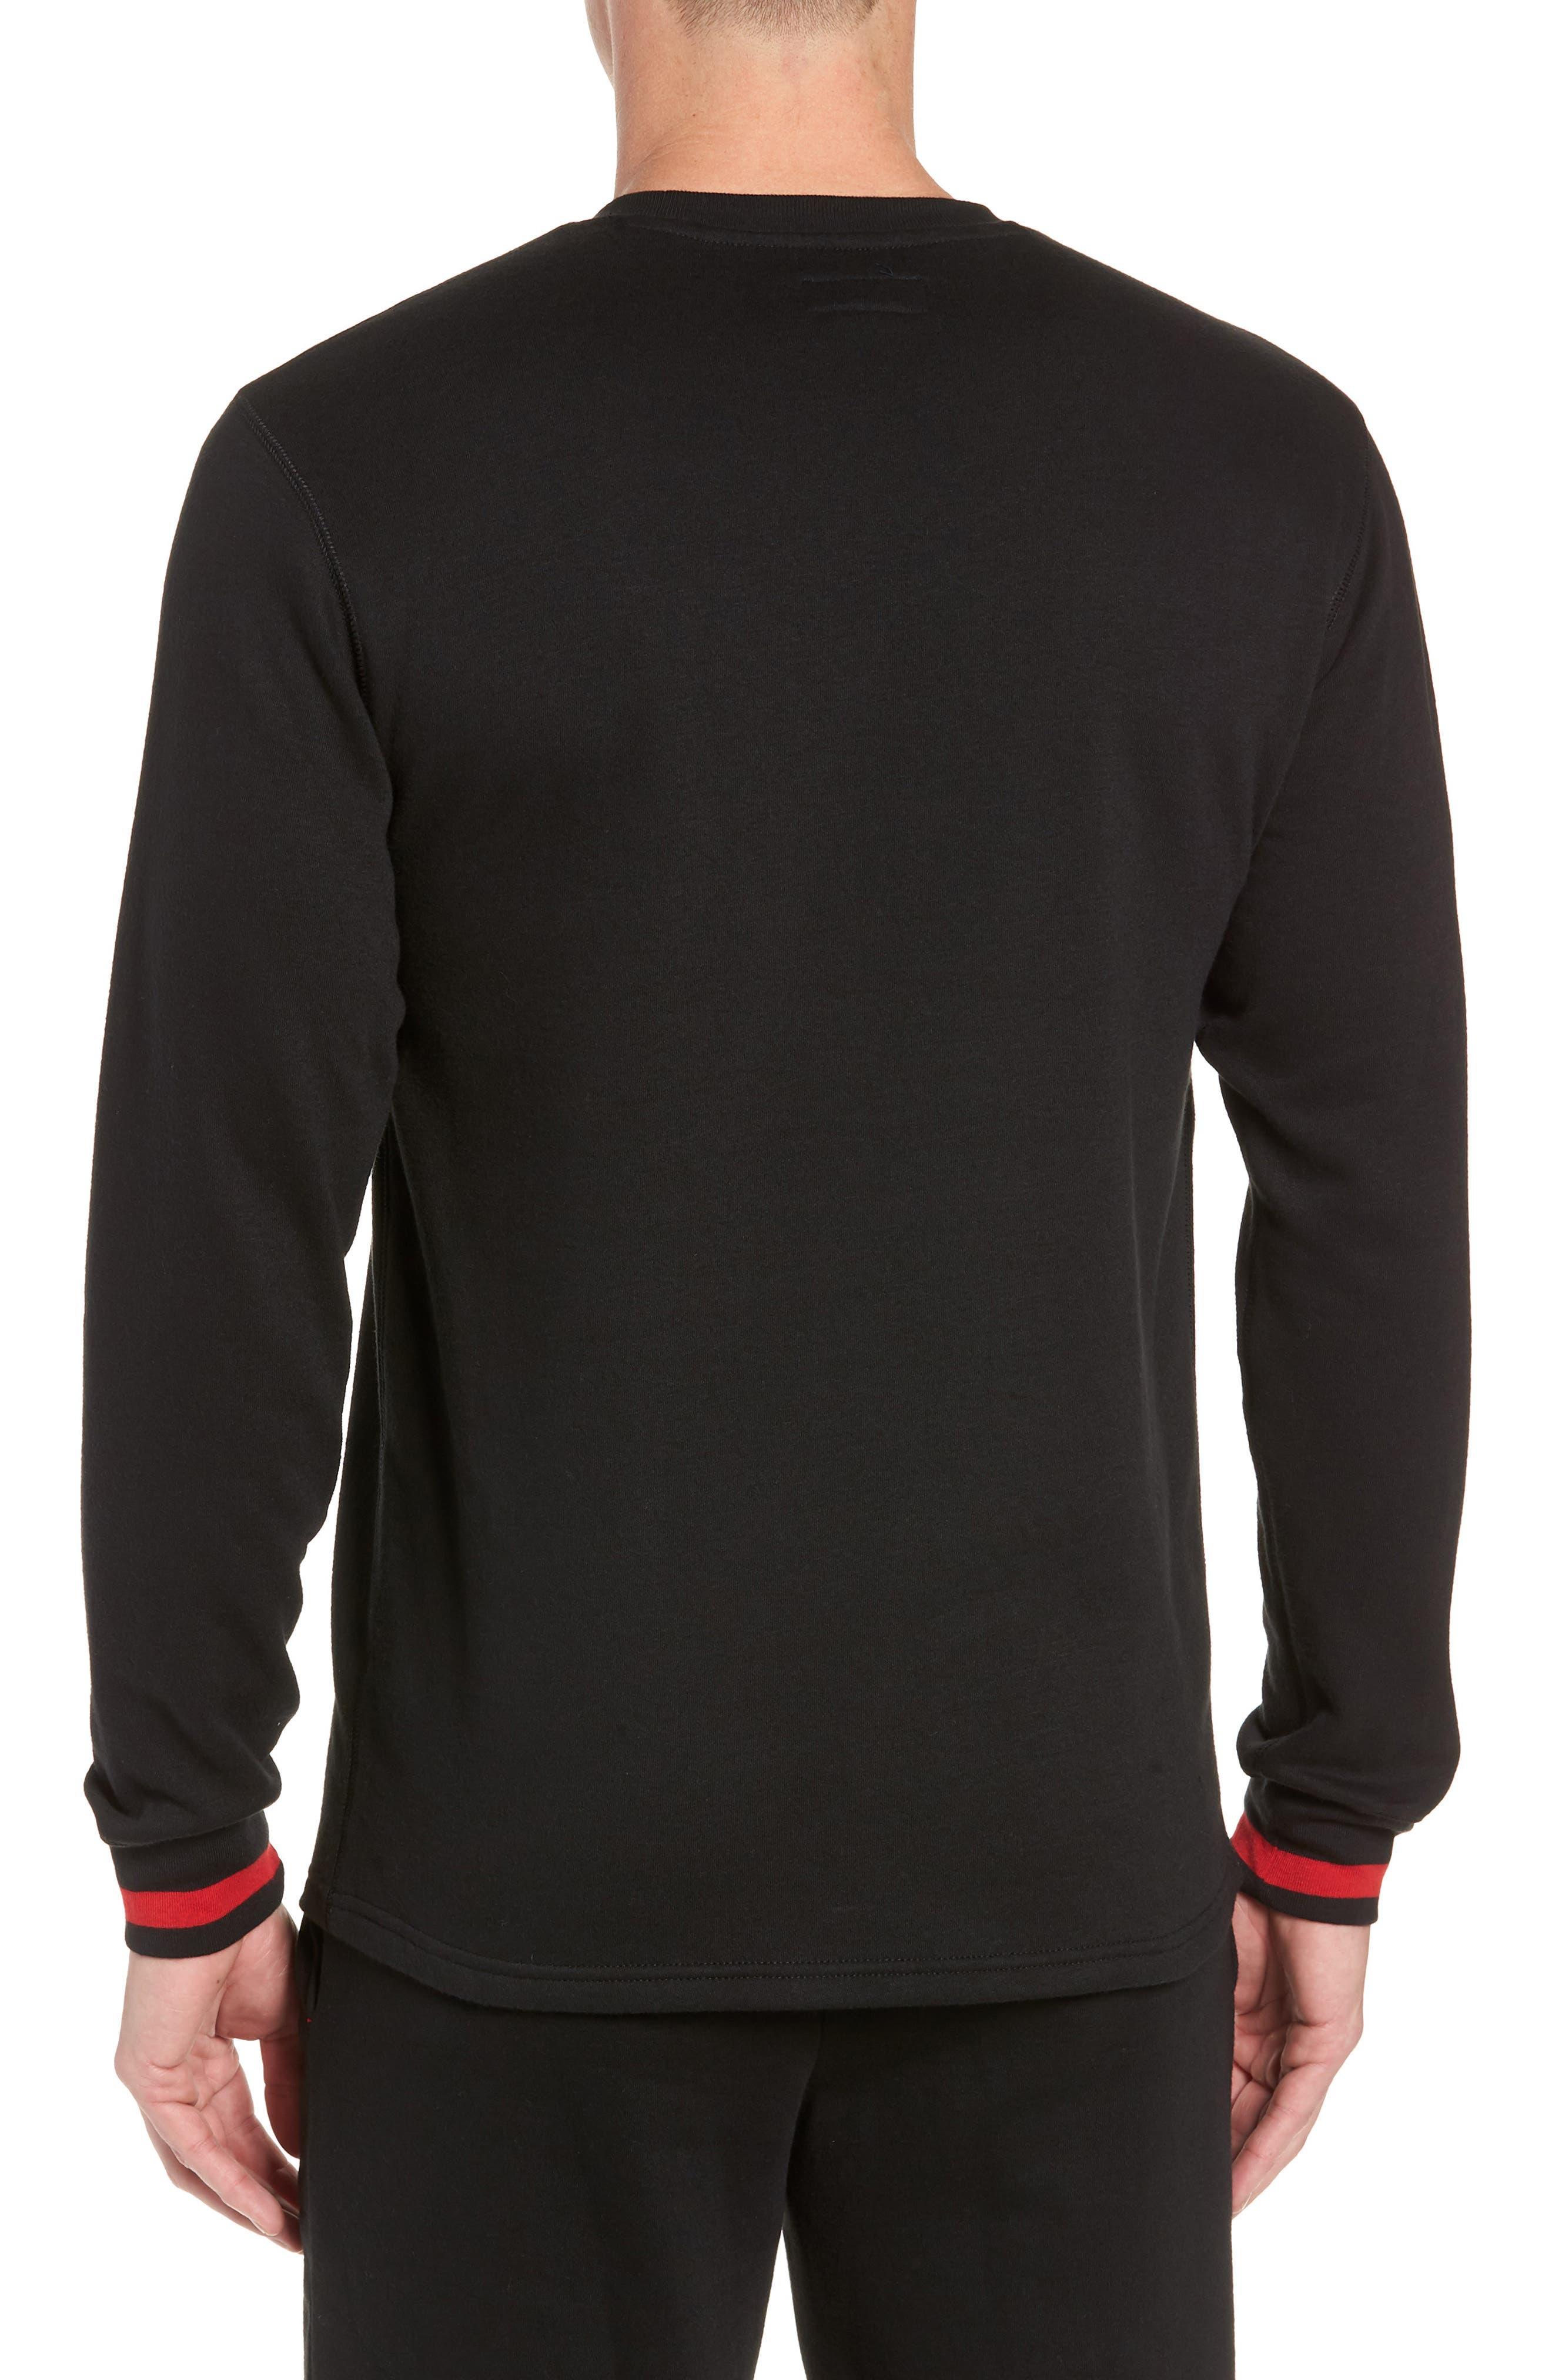 POLO RALPH LAUREN,                             Brushed Jersey Cotton Blend Crewneck Sweatshirt,                             Alternate thumbnail 2, color,                             POLO BLACK